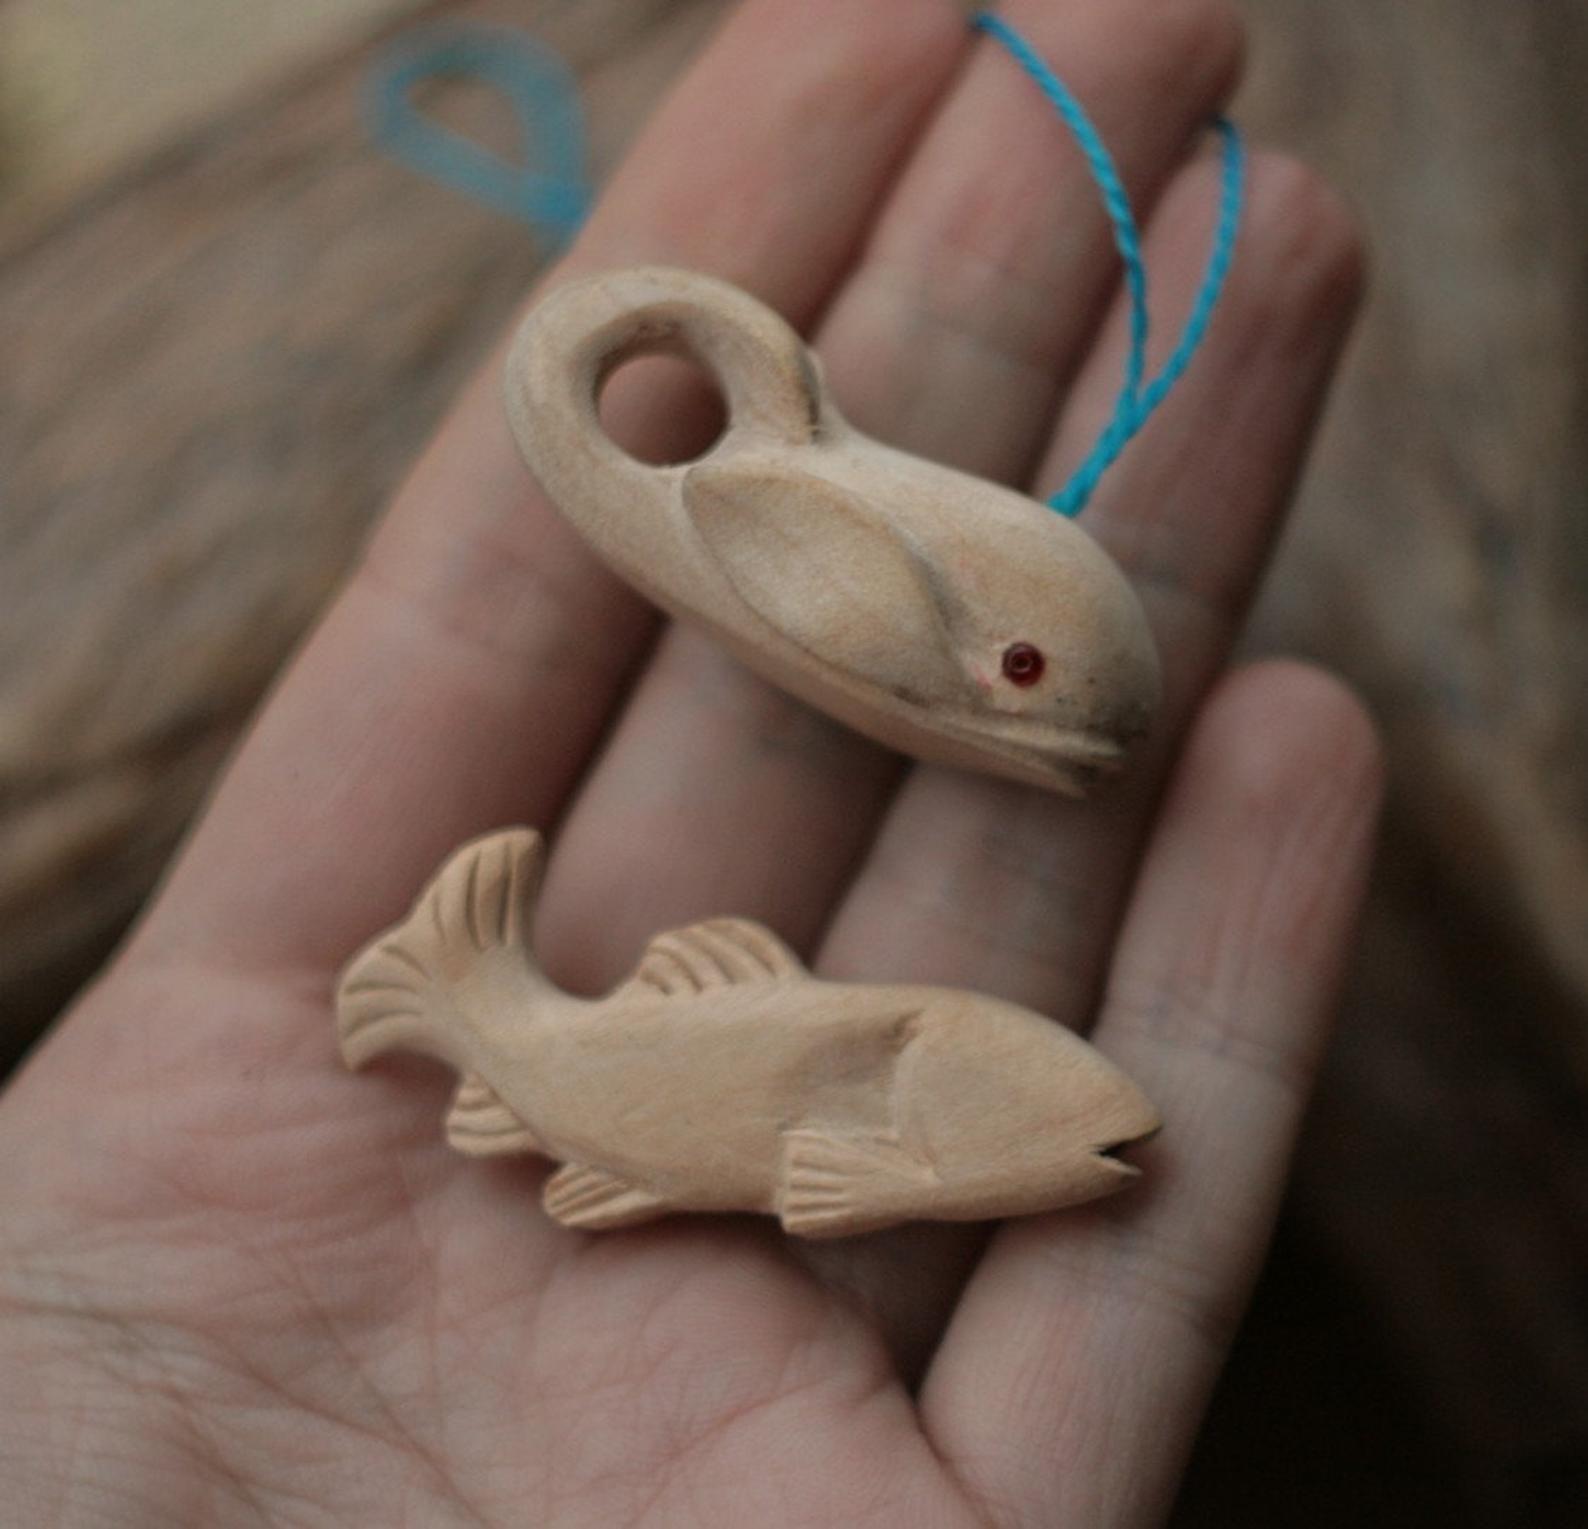 Large sea creature turtle crab dolphin whale water wacky weird funky earrings jewellery handmade gift present made cute lockdown gift treats